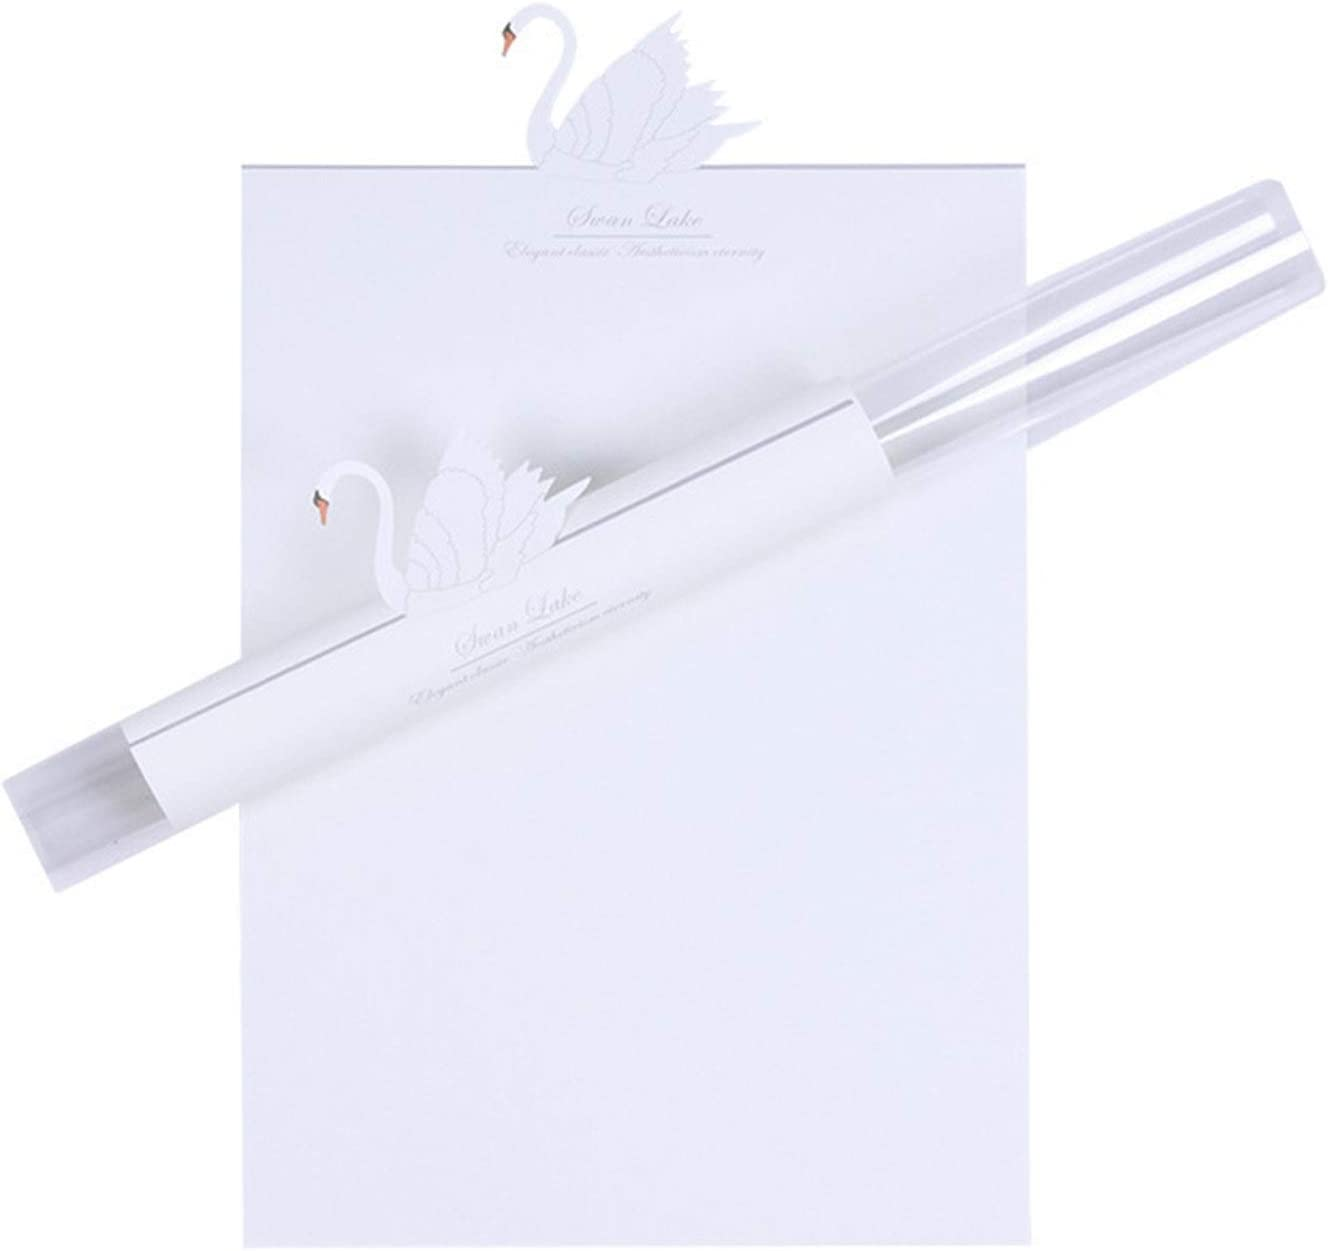 Jinrong 20sets latest 3D Swan Exclusive Flower Belittled Bunch Popular popular Packing